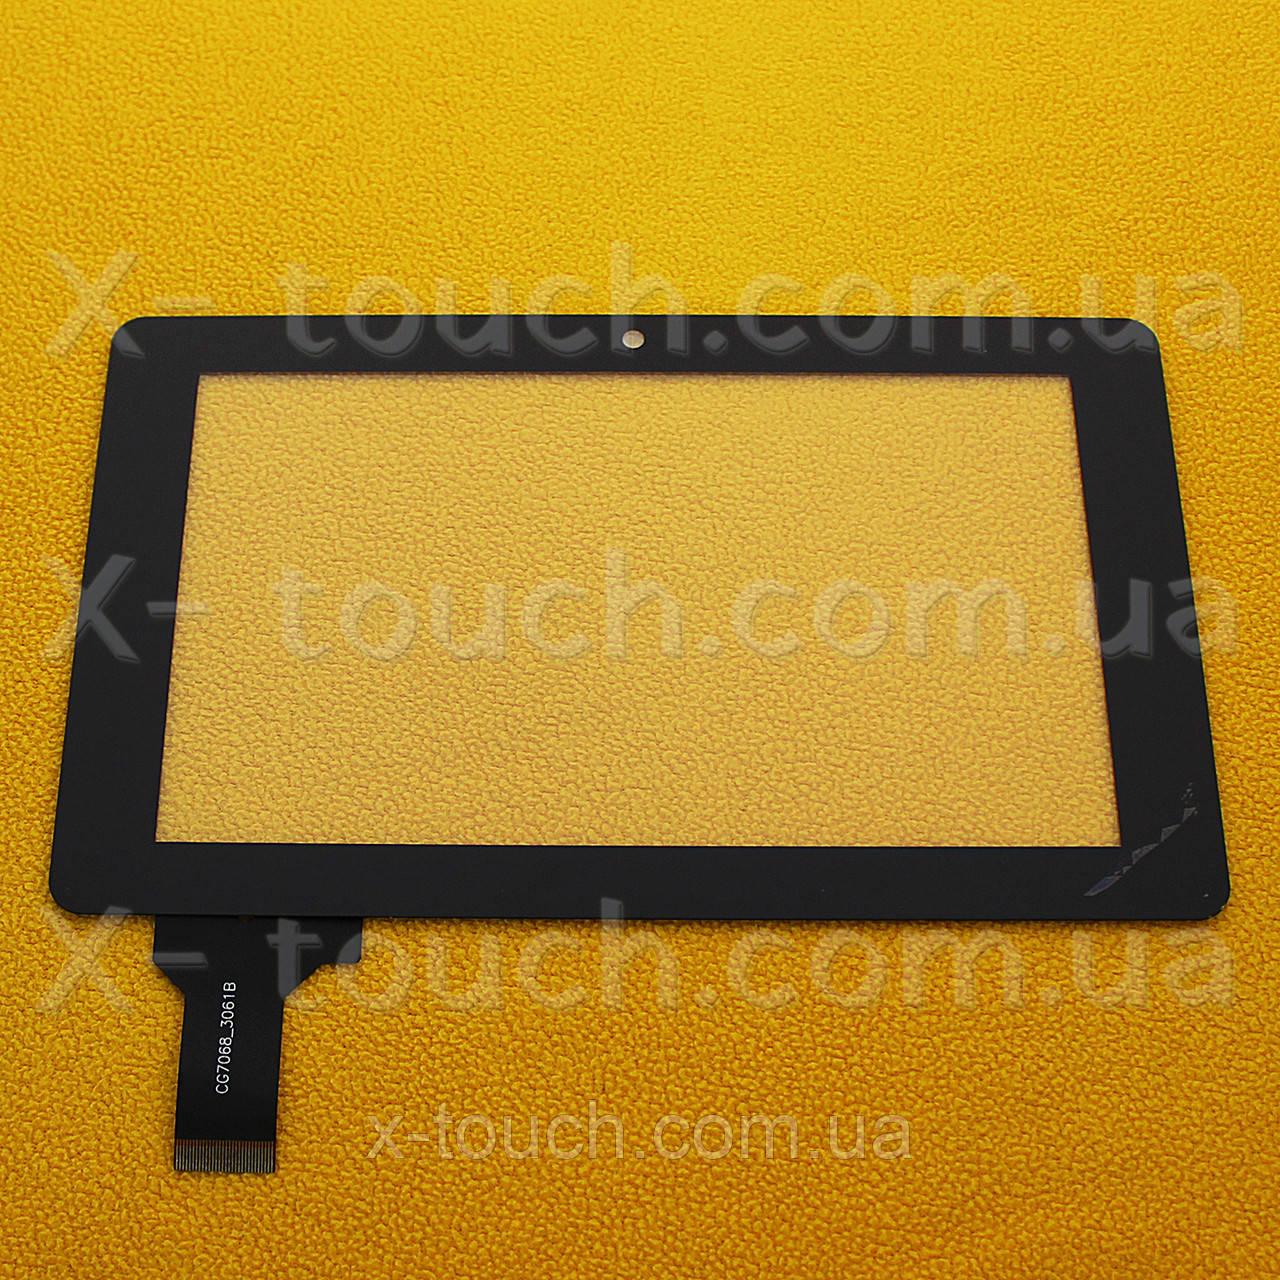 Тачскрин, сенсор  CG7068_3061B  для планшета